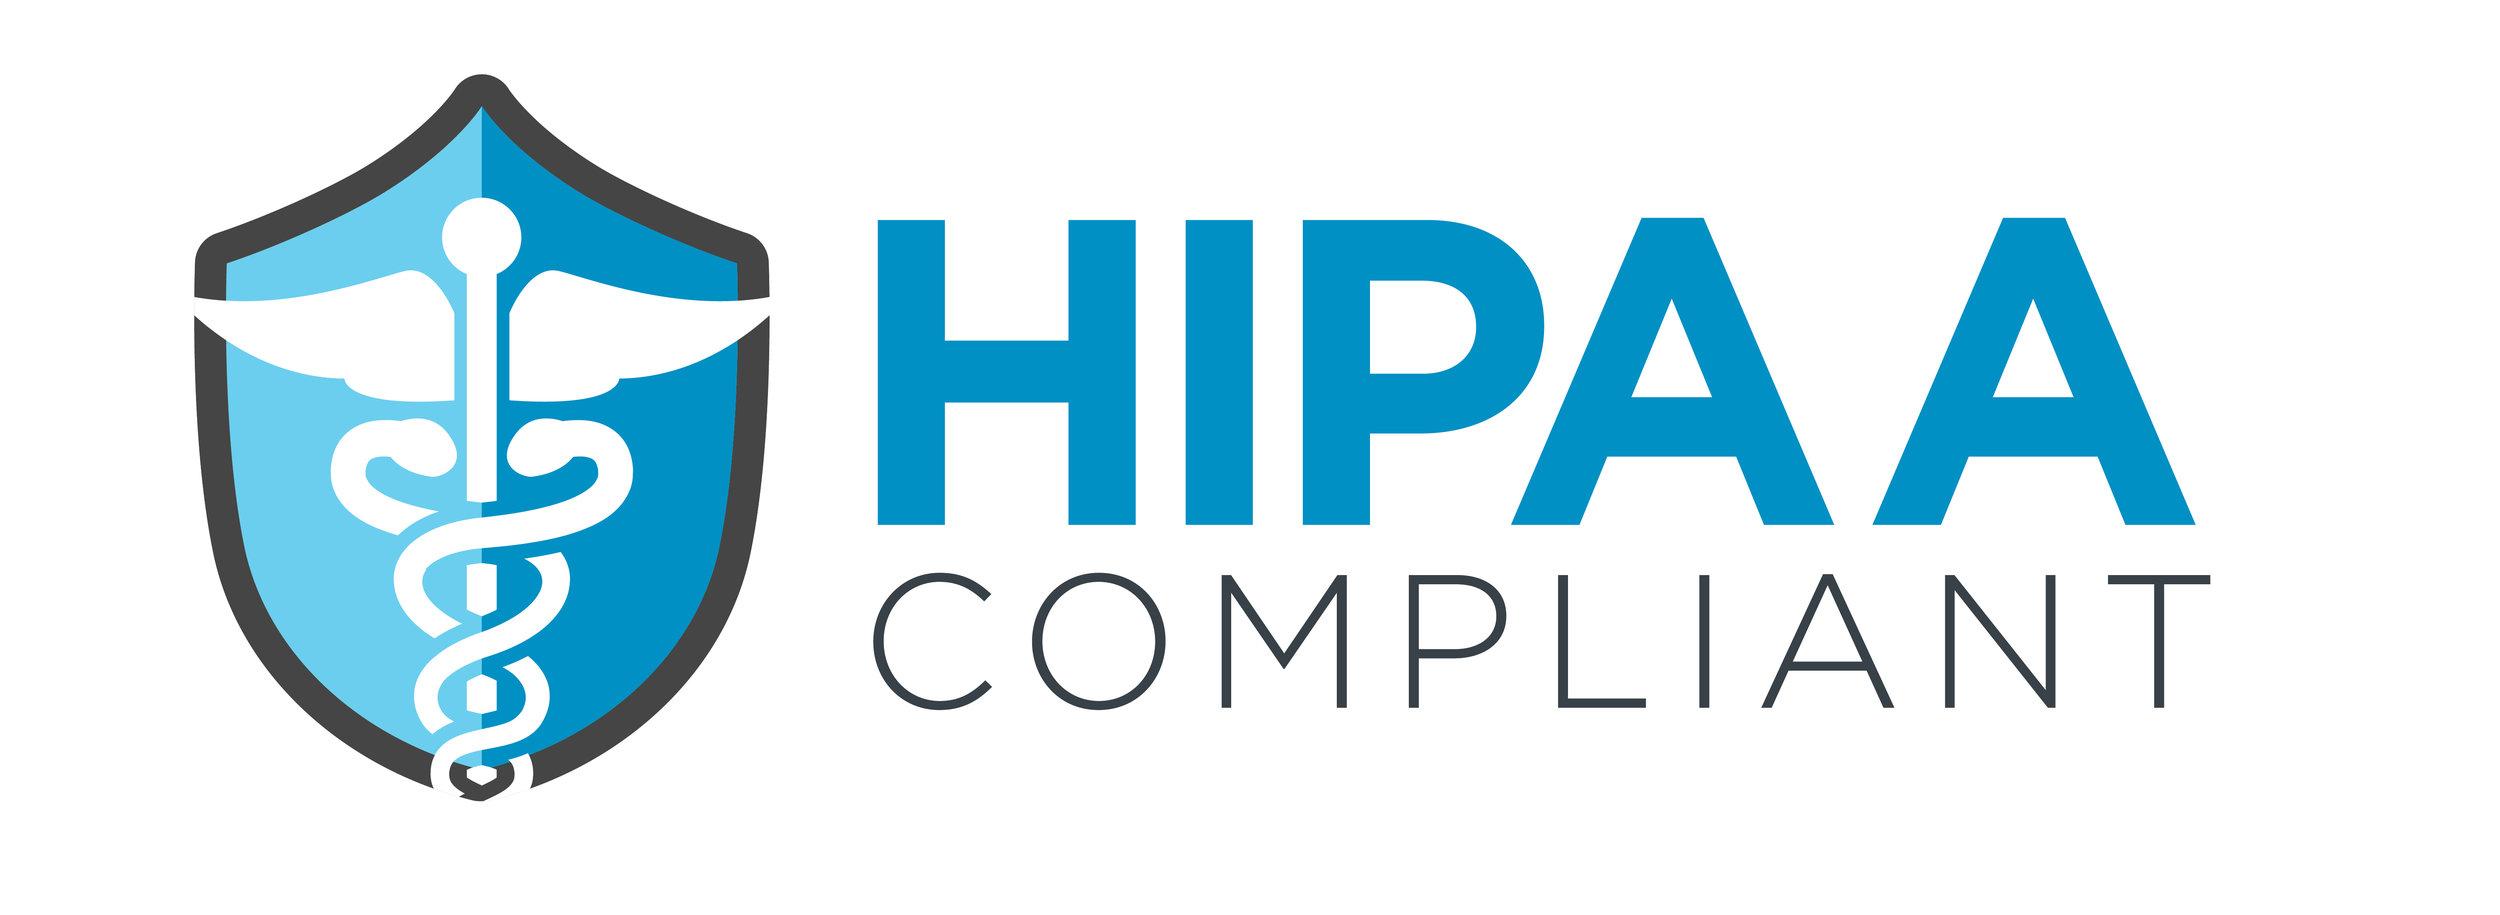 HIPAA Compliant.jpg